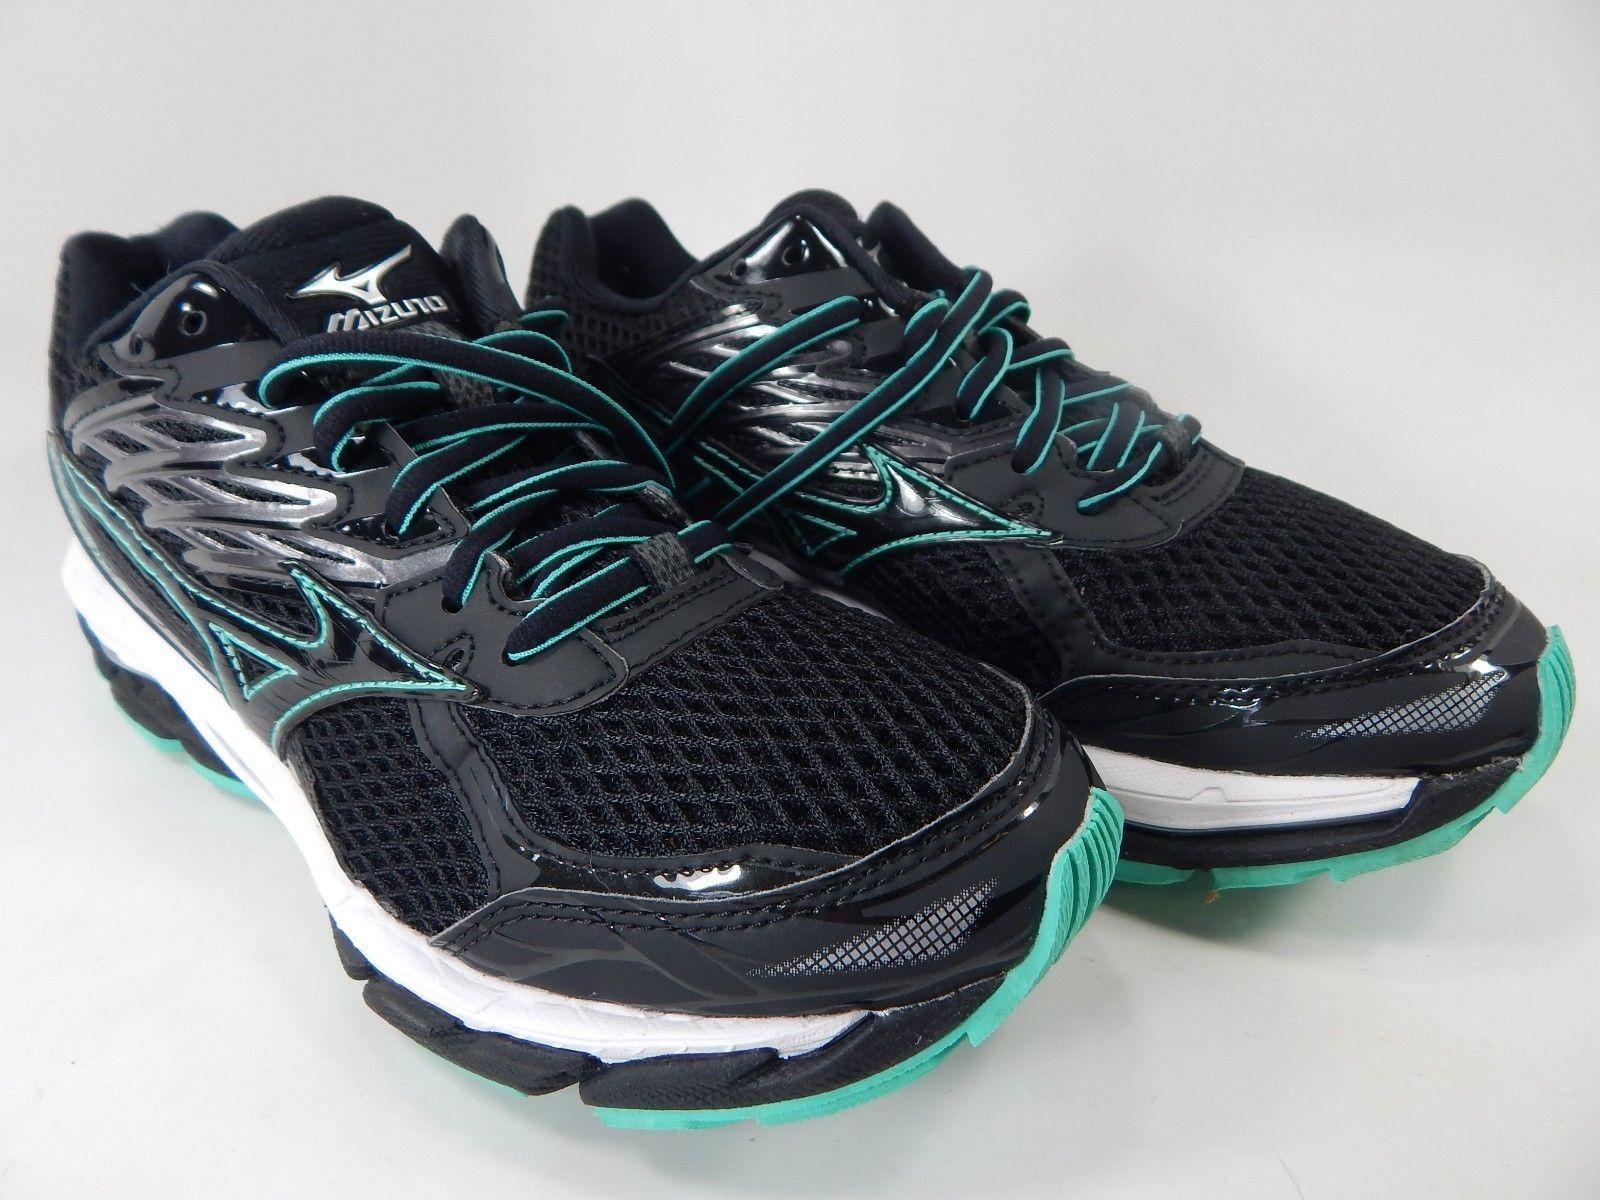 Mizuno Wave Paradox 3 Size US 7 M (B) EU 37 Women's Running Shoes Black Green